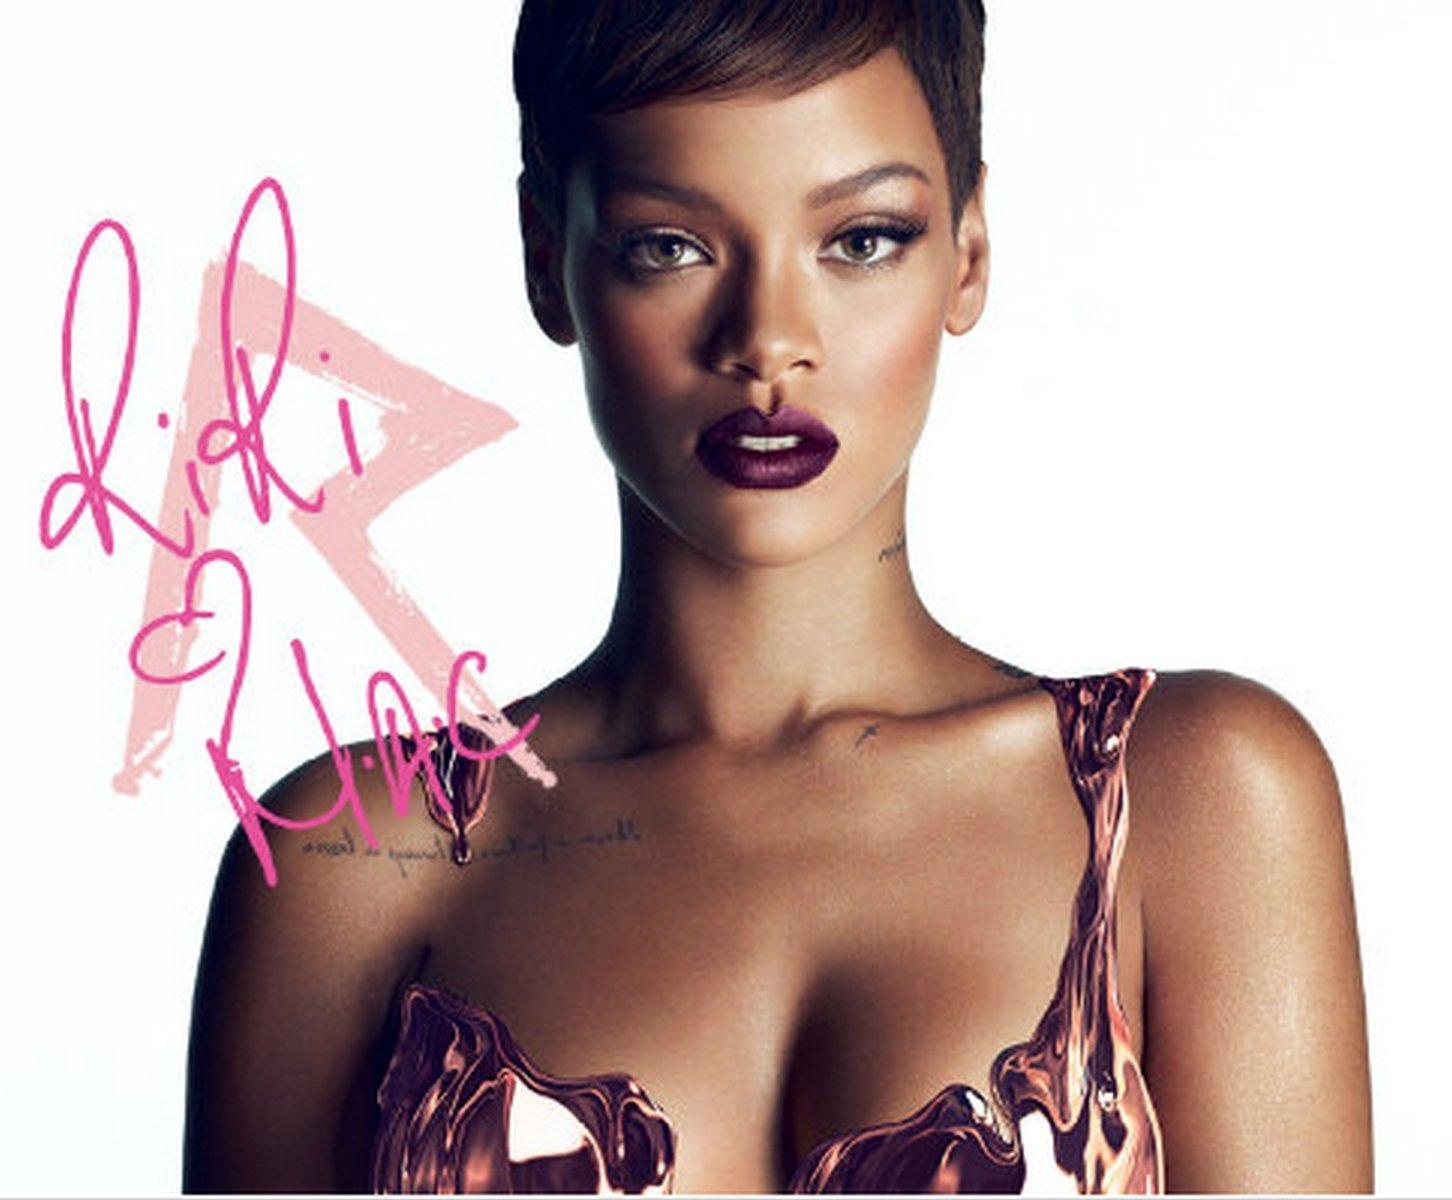 Amazon.com : Riri Hearts Mac Fall Collection Nude Lipstick : Mac Matte Lipstick Nude : Beauty